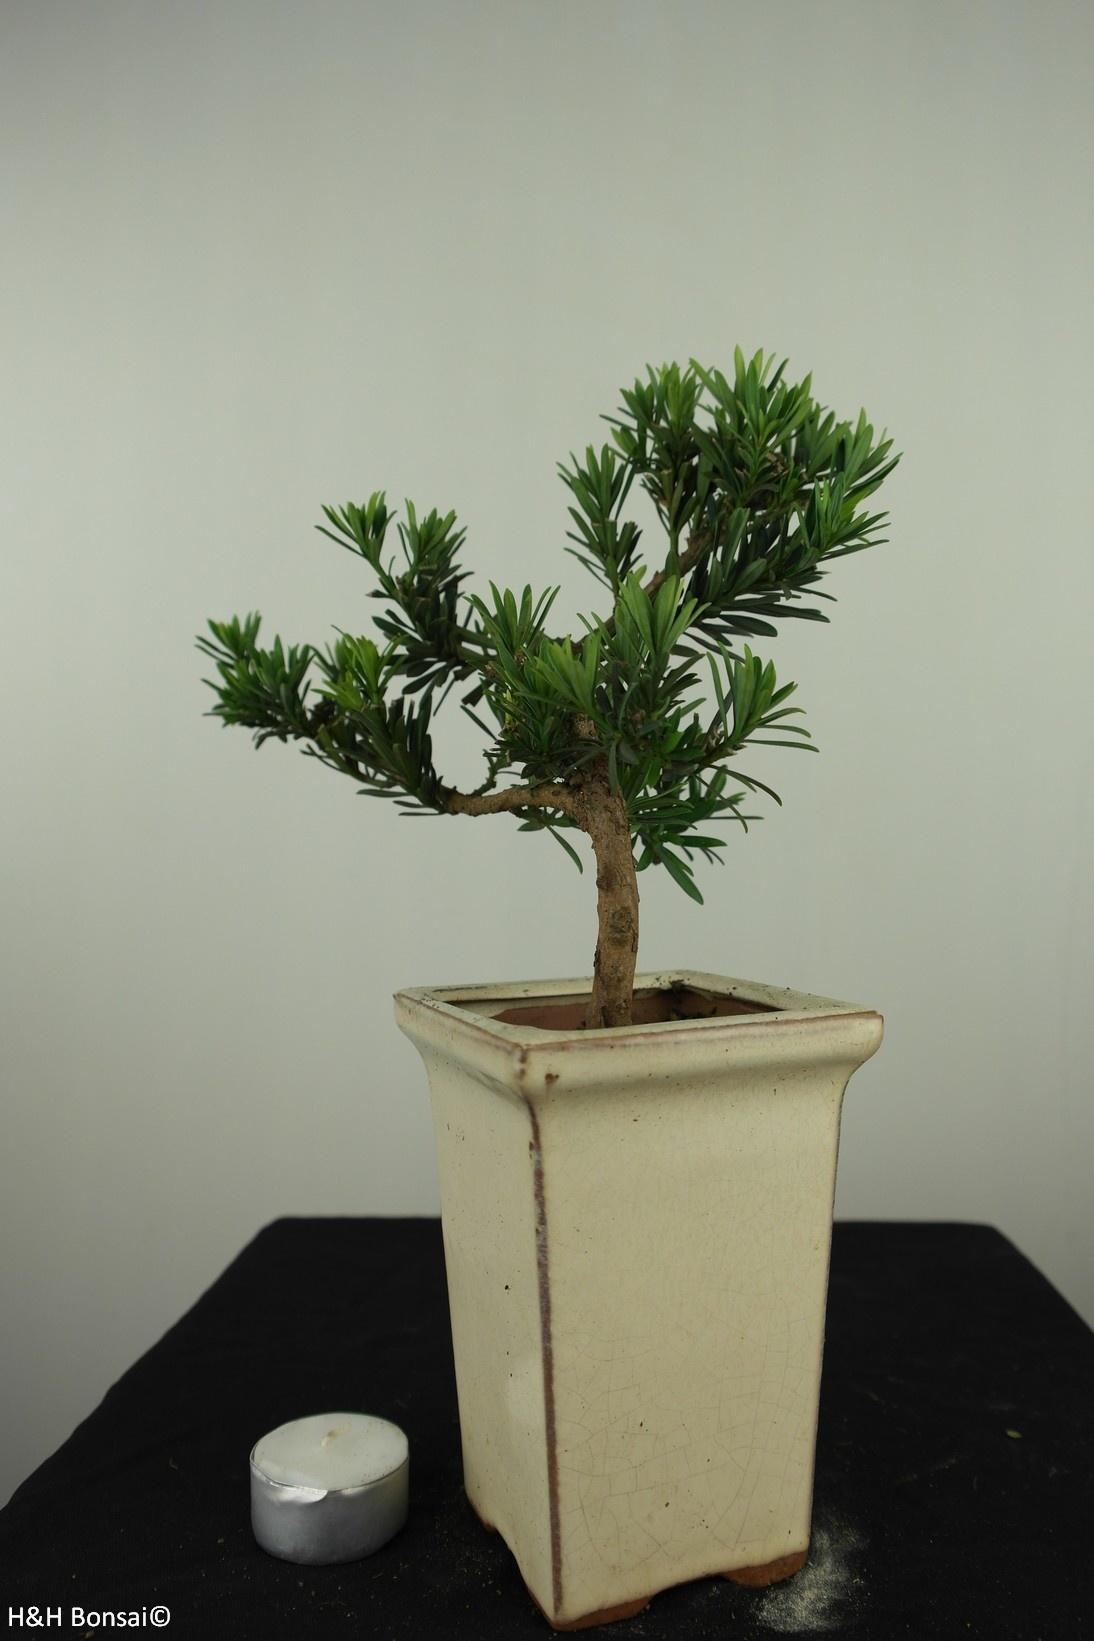 Bonsai Buddhist Pine, Podocarpus, no. 7599